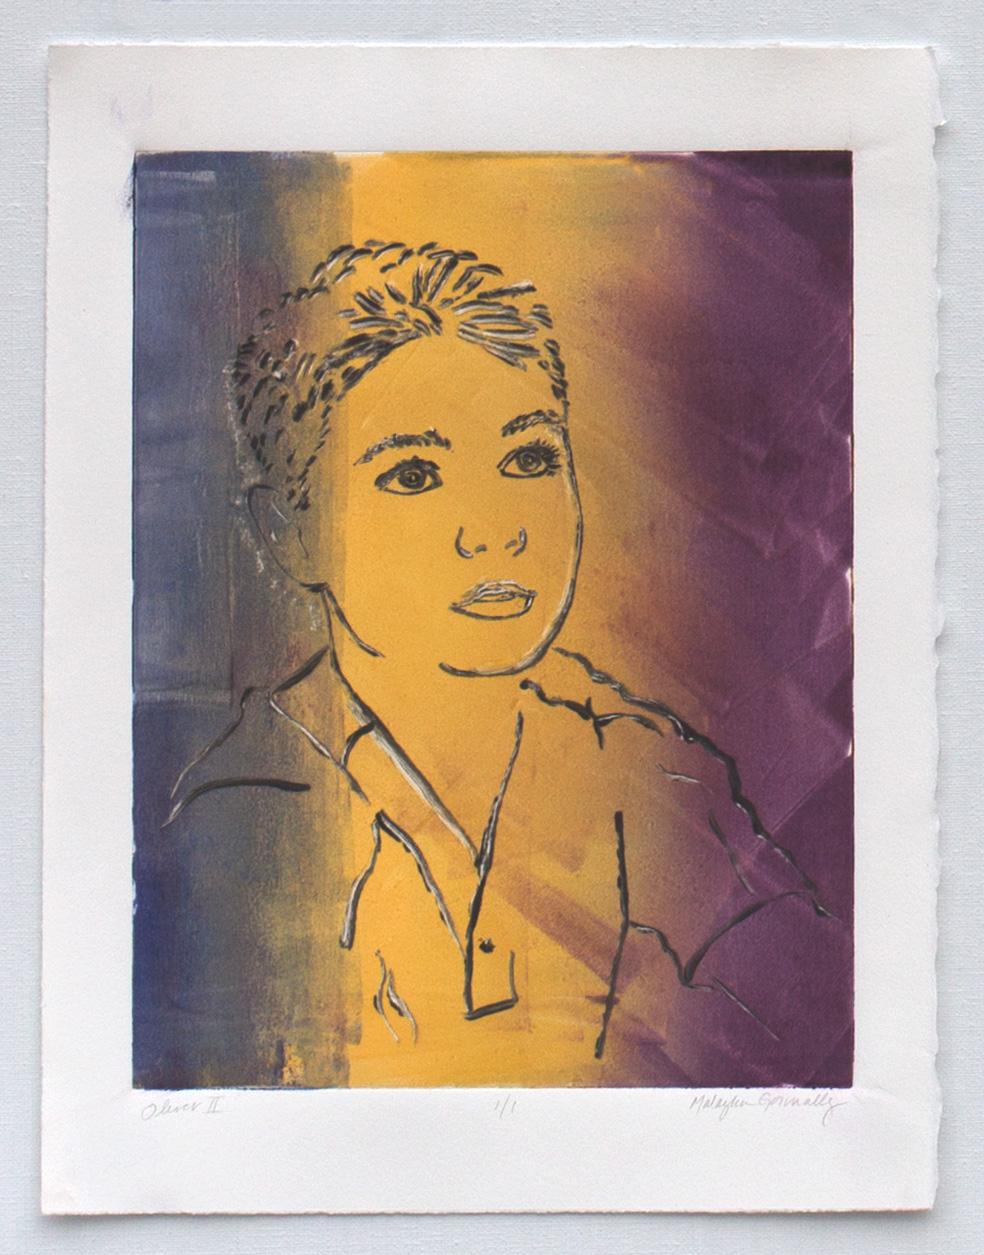 portrait-monotype-print-boy-artist-malayka-gormally-painter.jpg